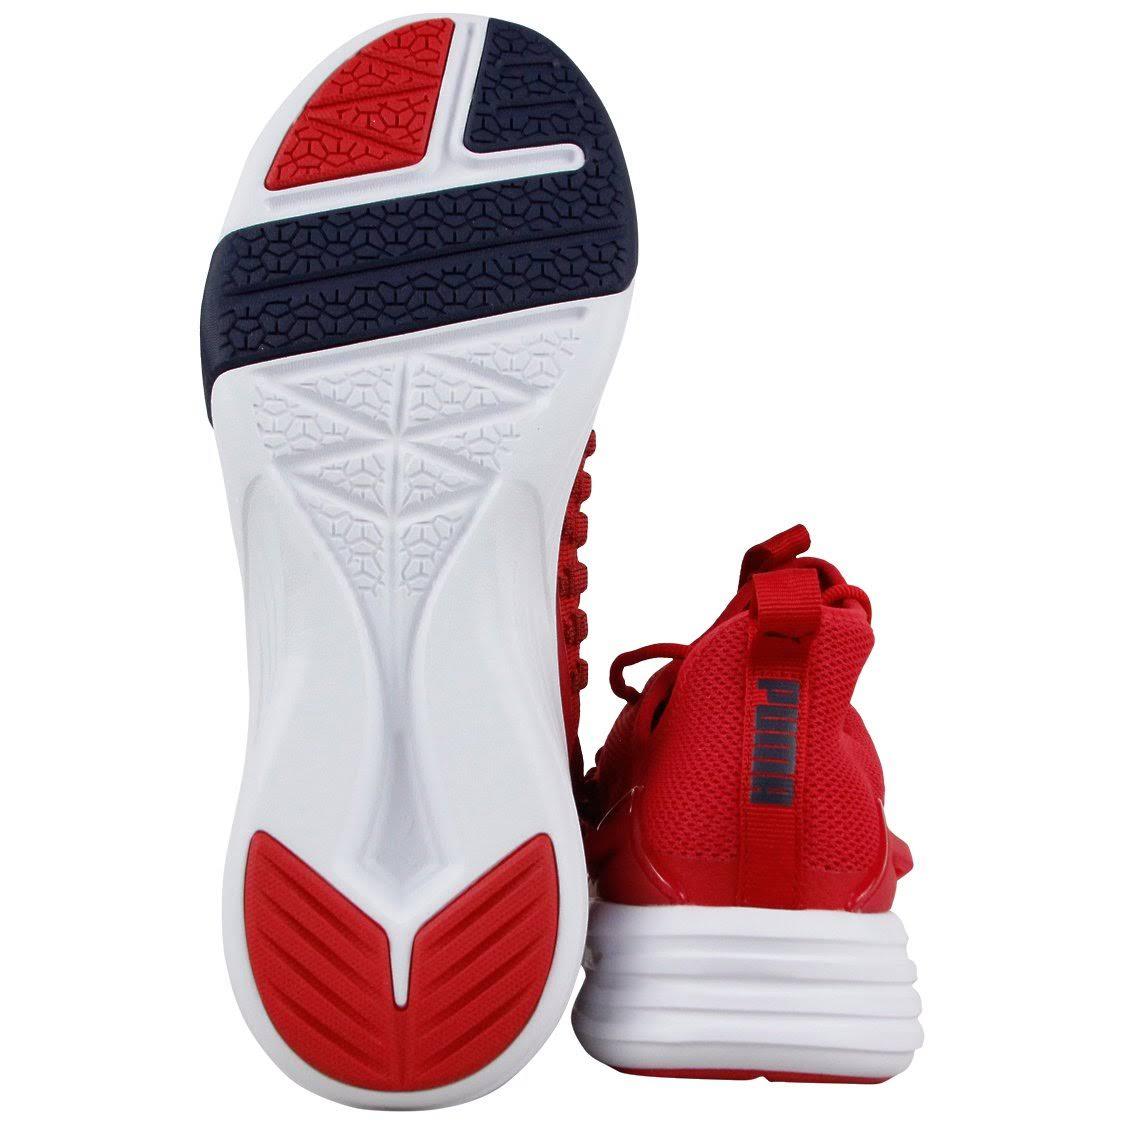 puma Mantra Fusefit Puma Entrenamiento Para Atlético Red Hombre Ribbon De Zapatos White Red 7OqqUwa